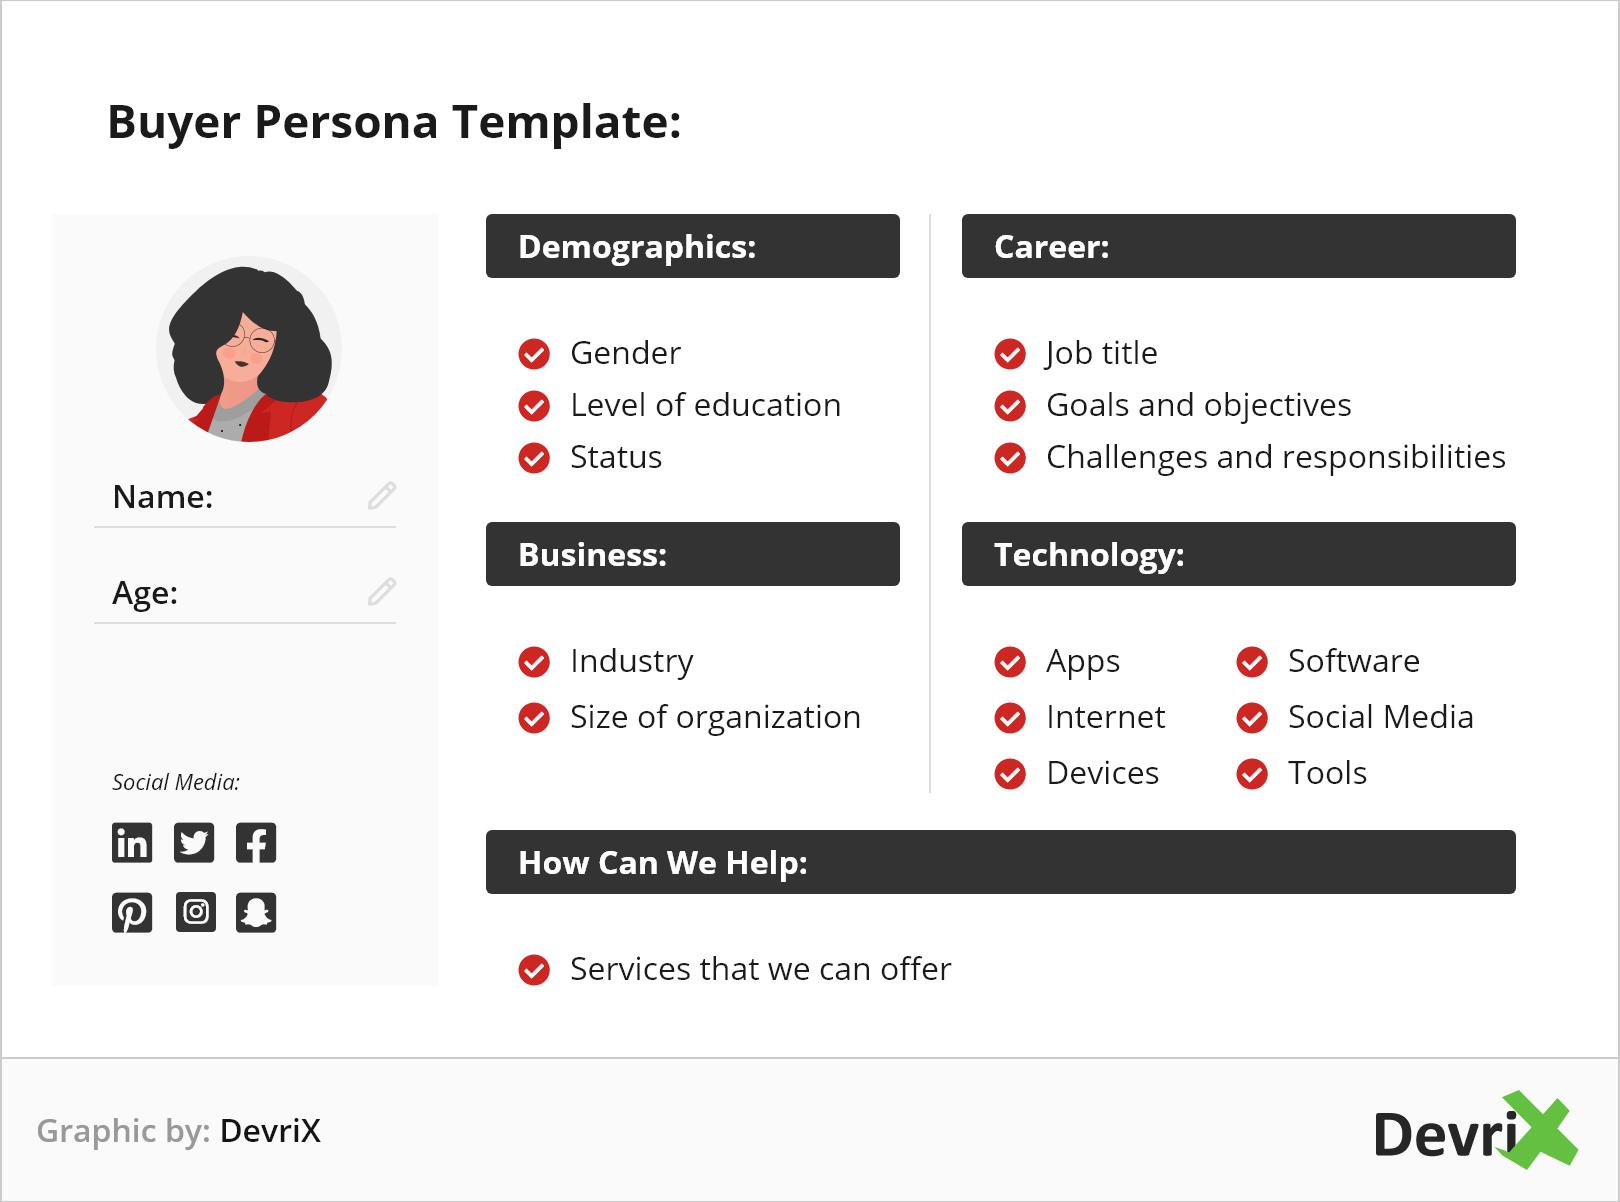 Buyer-persona-template@2x